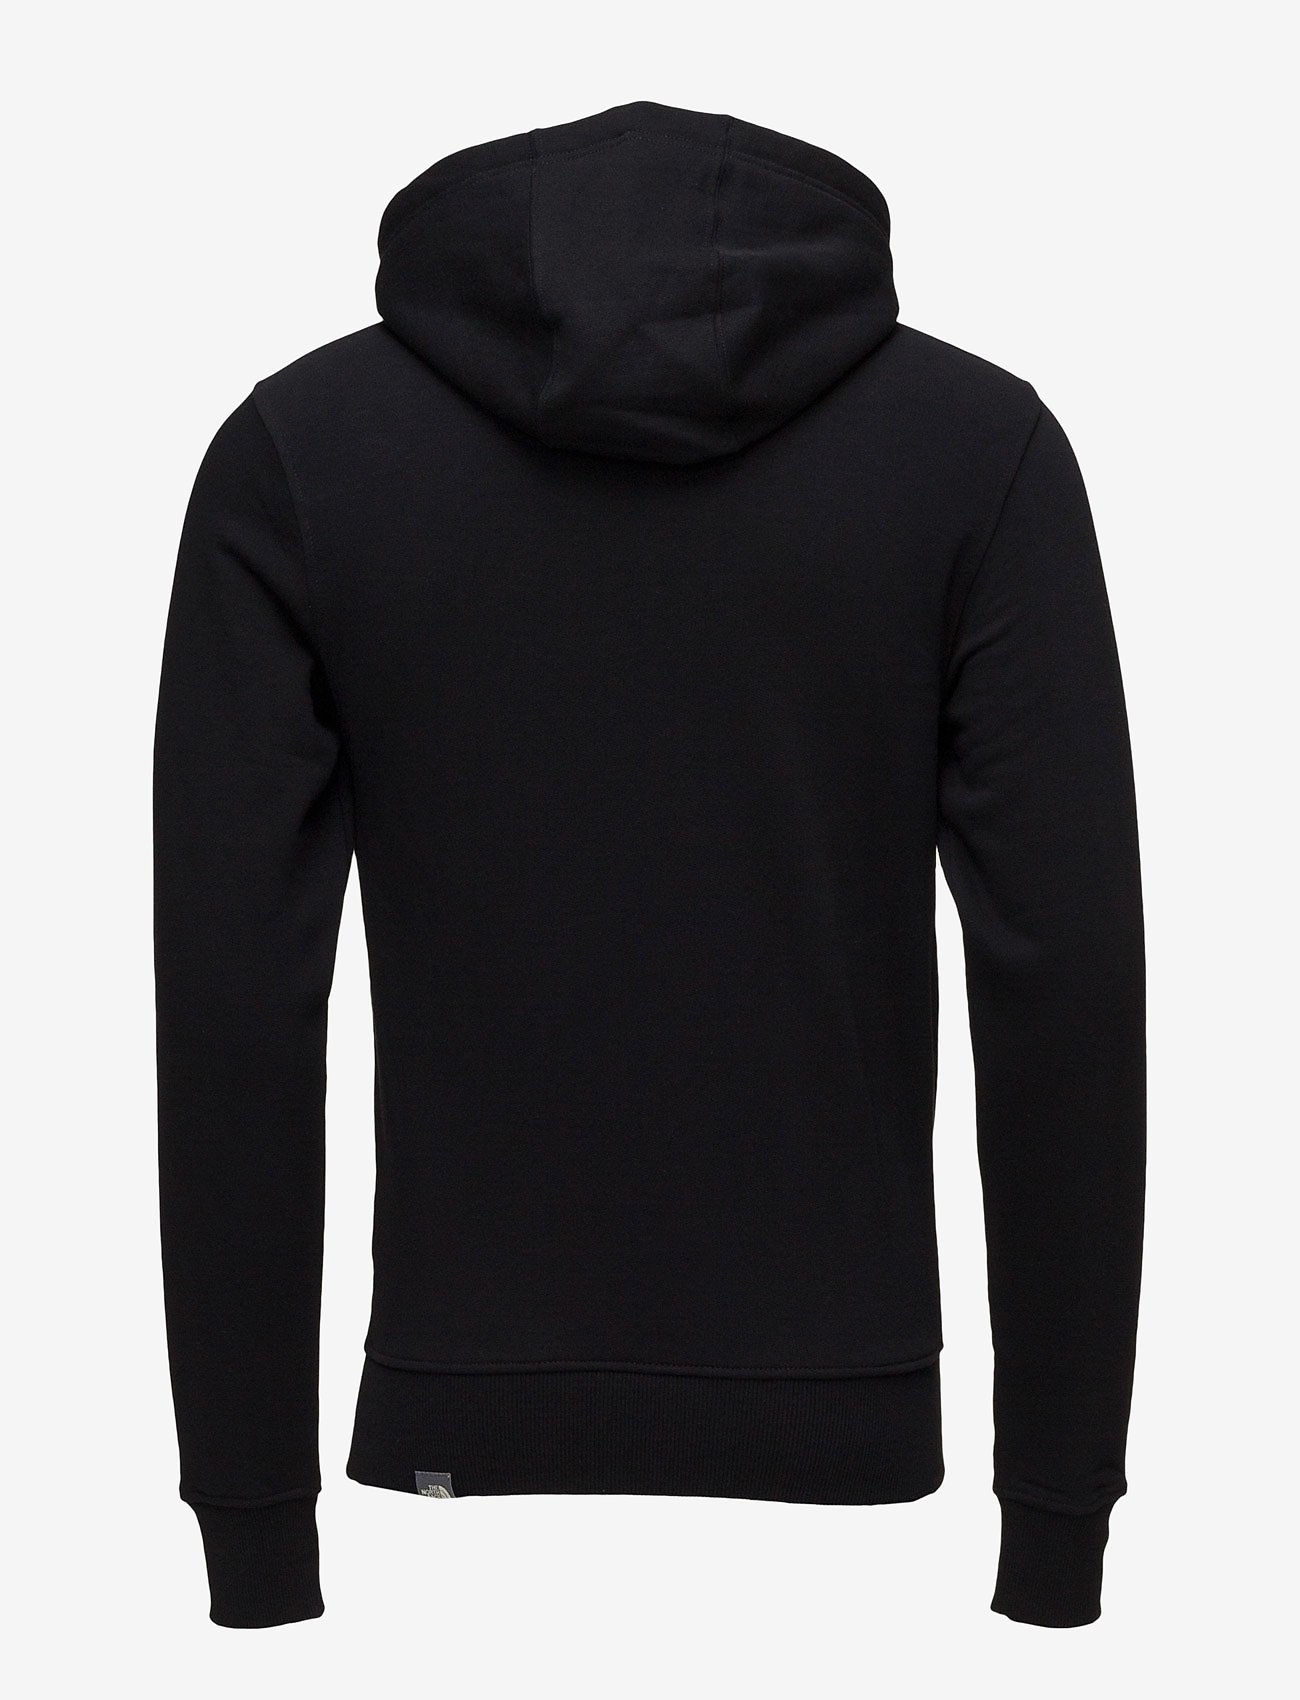 The North Face - M DREW PEAK PLV HD - džemperi ar kapuci - tnf blk/tnf blk - 1